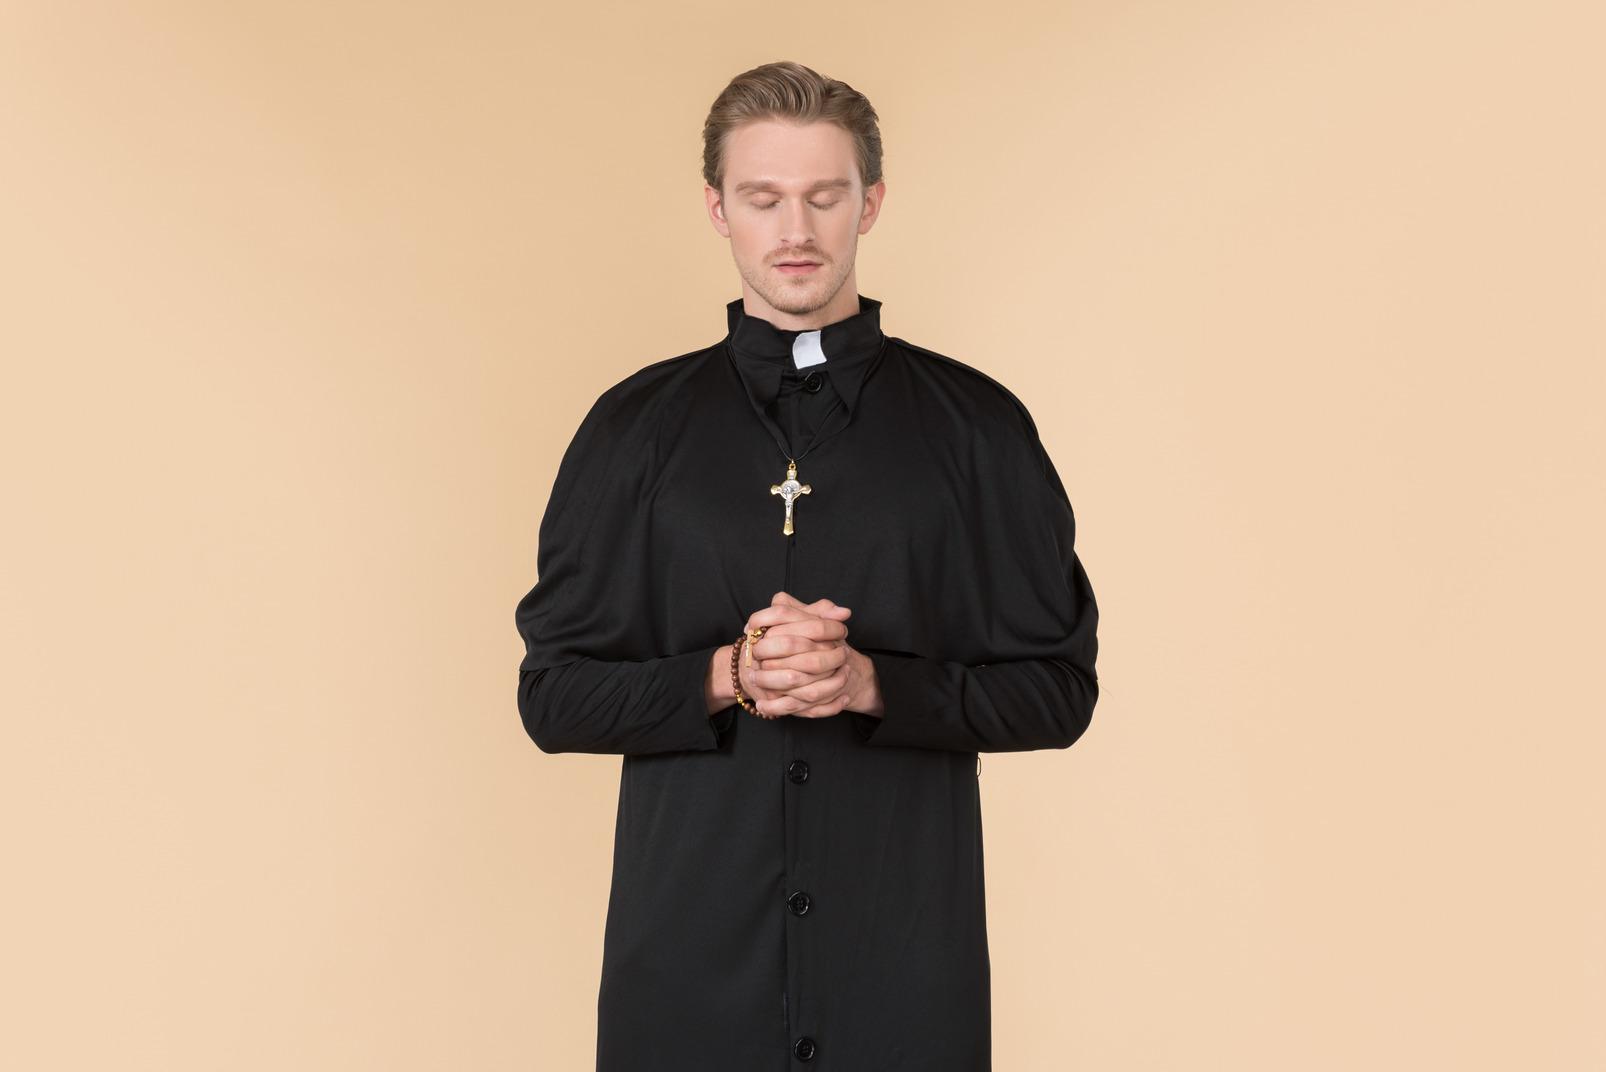 Catholic priest praying using prayer beads